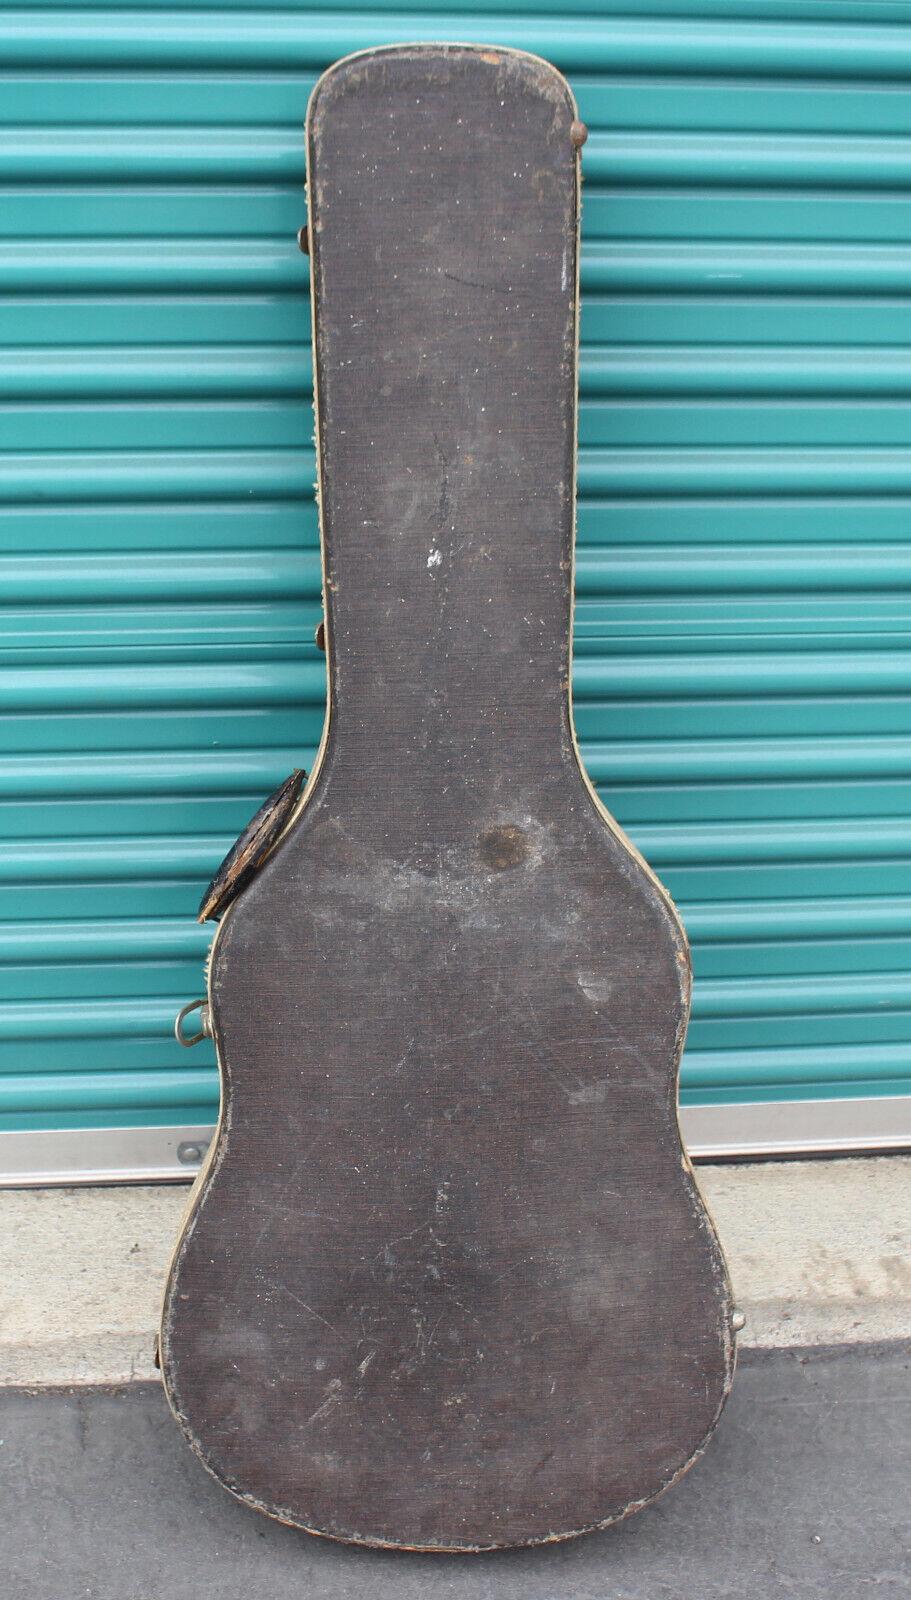 Vintage Guitar Hardshell Hard Case Hollow Body Hardcase rot Interior Gretsch